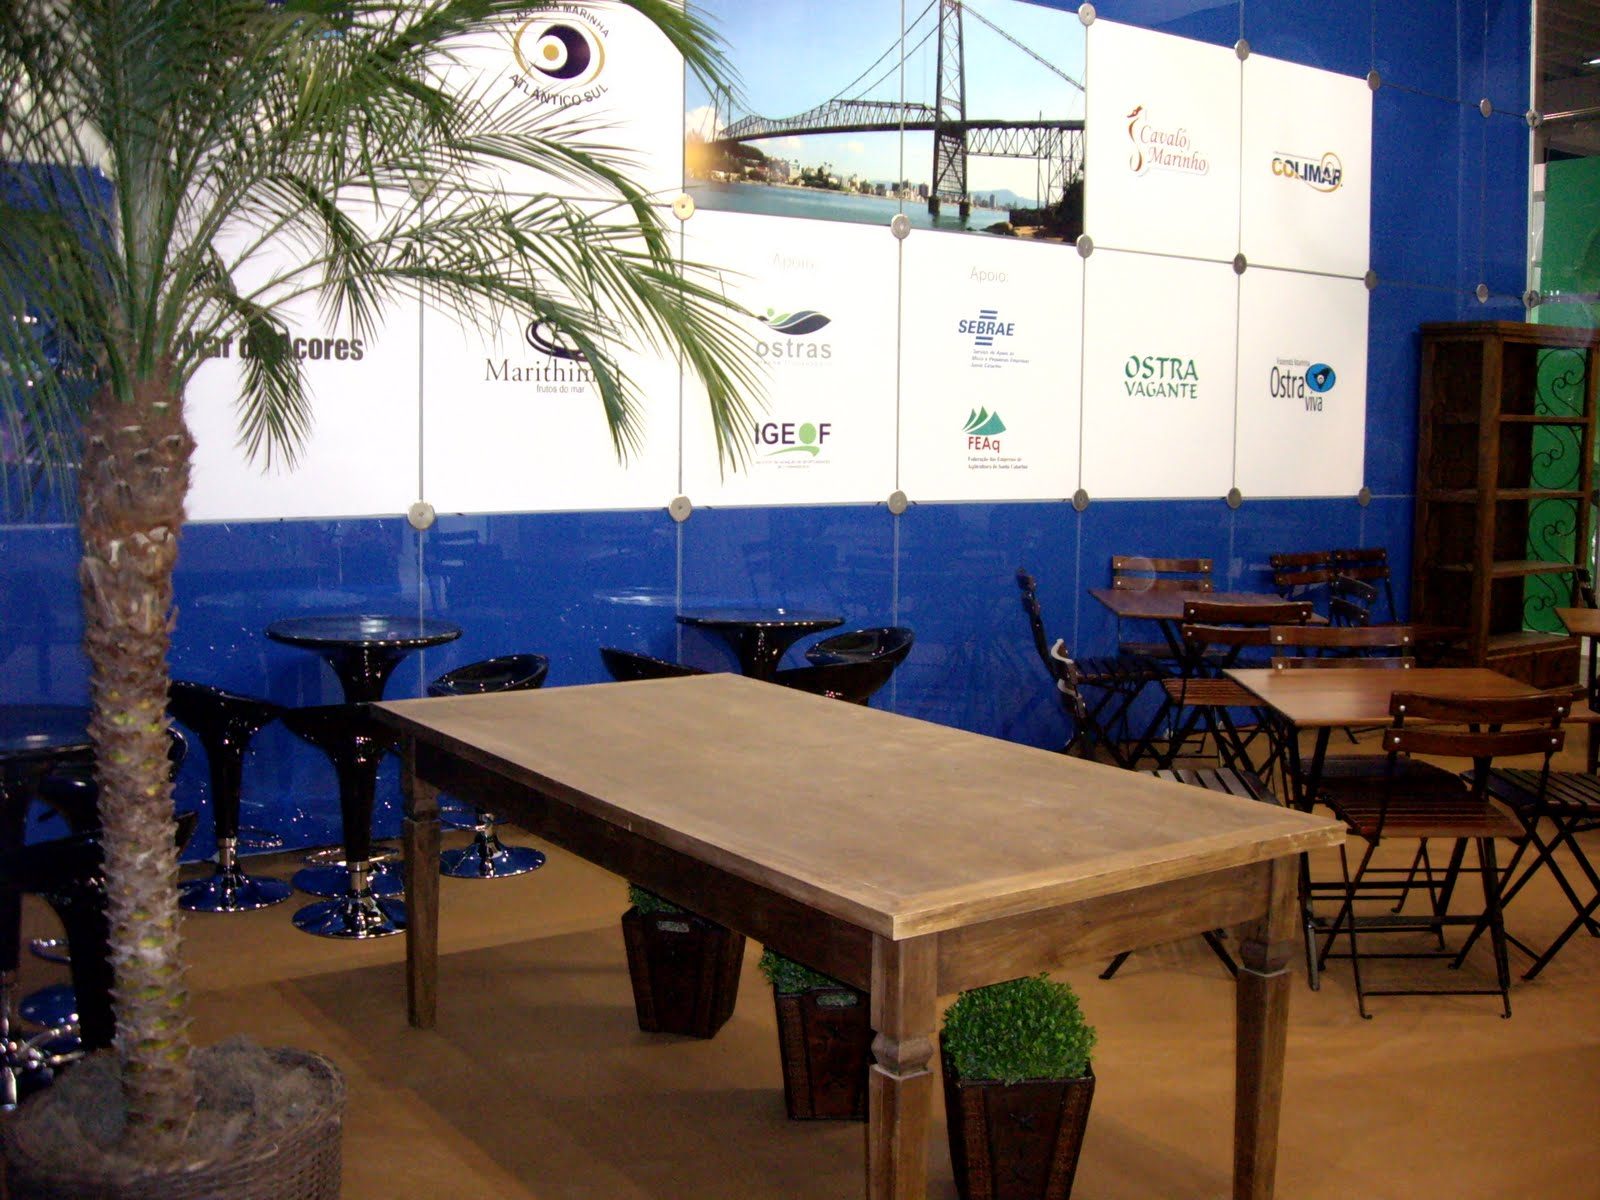 Madera loca o de mobili rio de estilo evento sebrae - Estilos de mobiliario ...